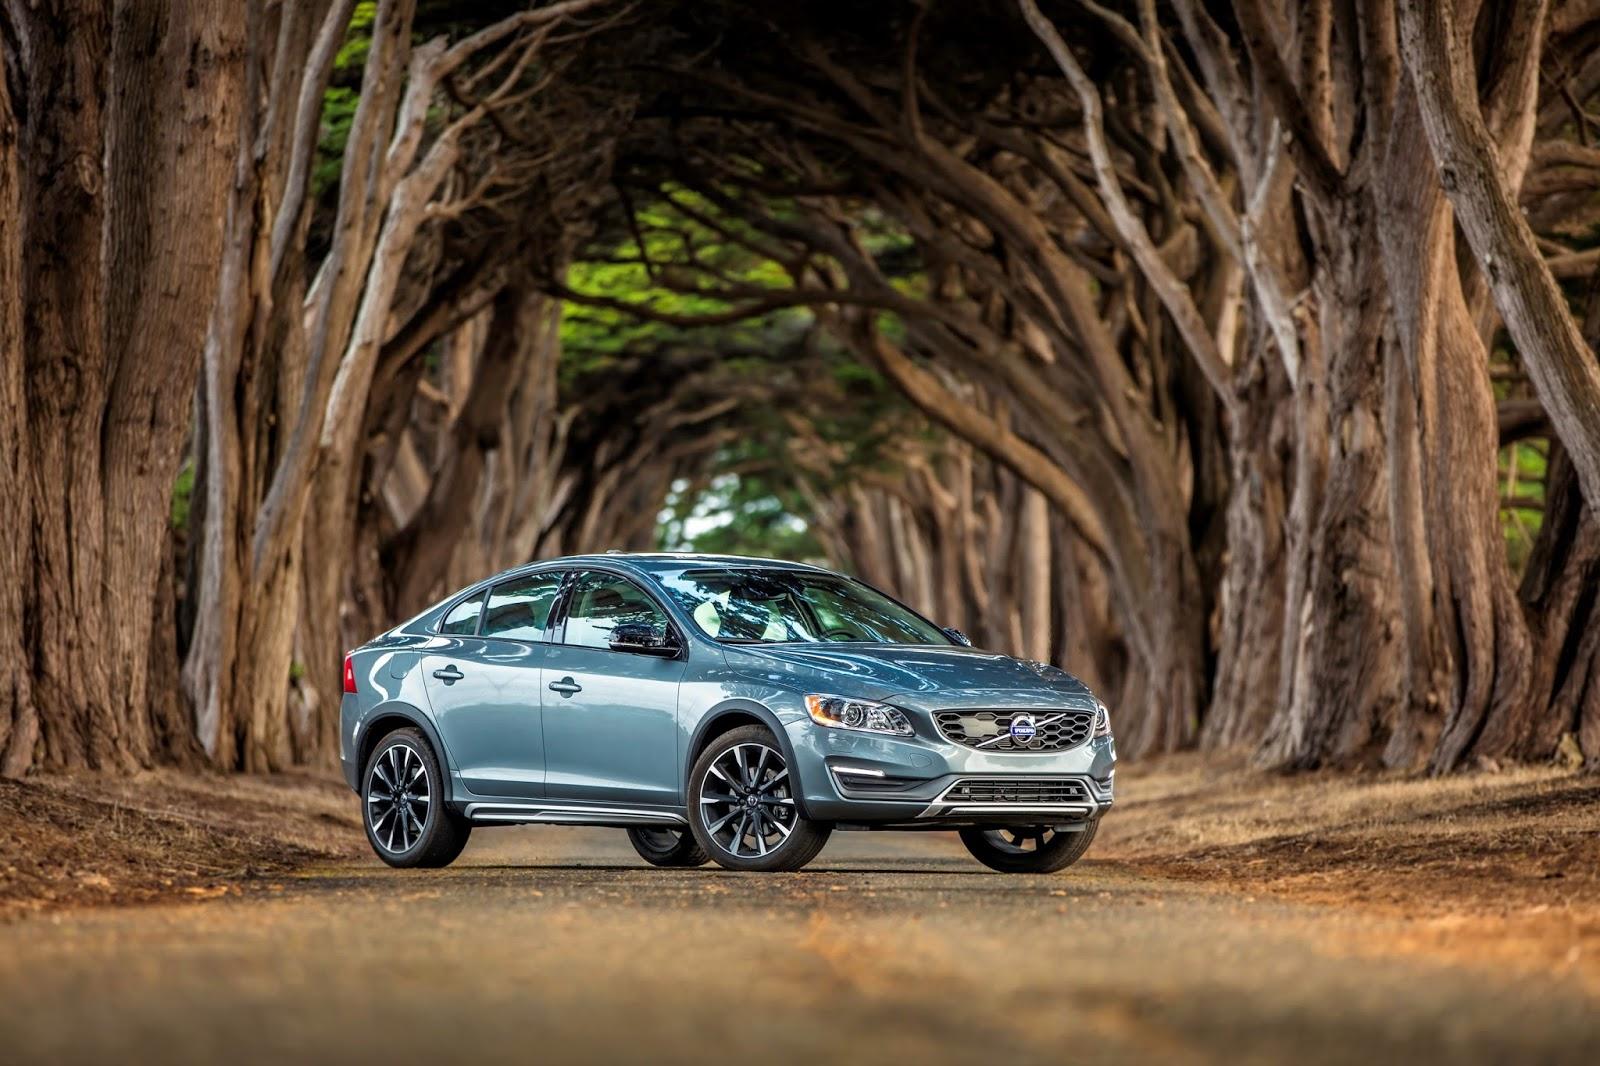 VOLVO%2BS60%2BCROSS%2BCOUNTRY Η Volvo με το νέο S60 Cross Country δημιουργεί το πρώτο sedan με διττό χαρακτήρα